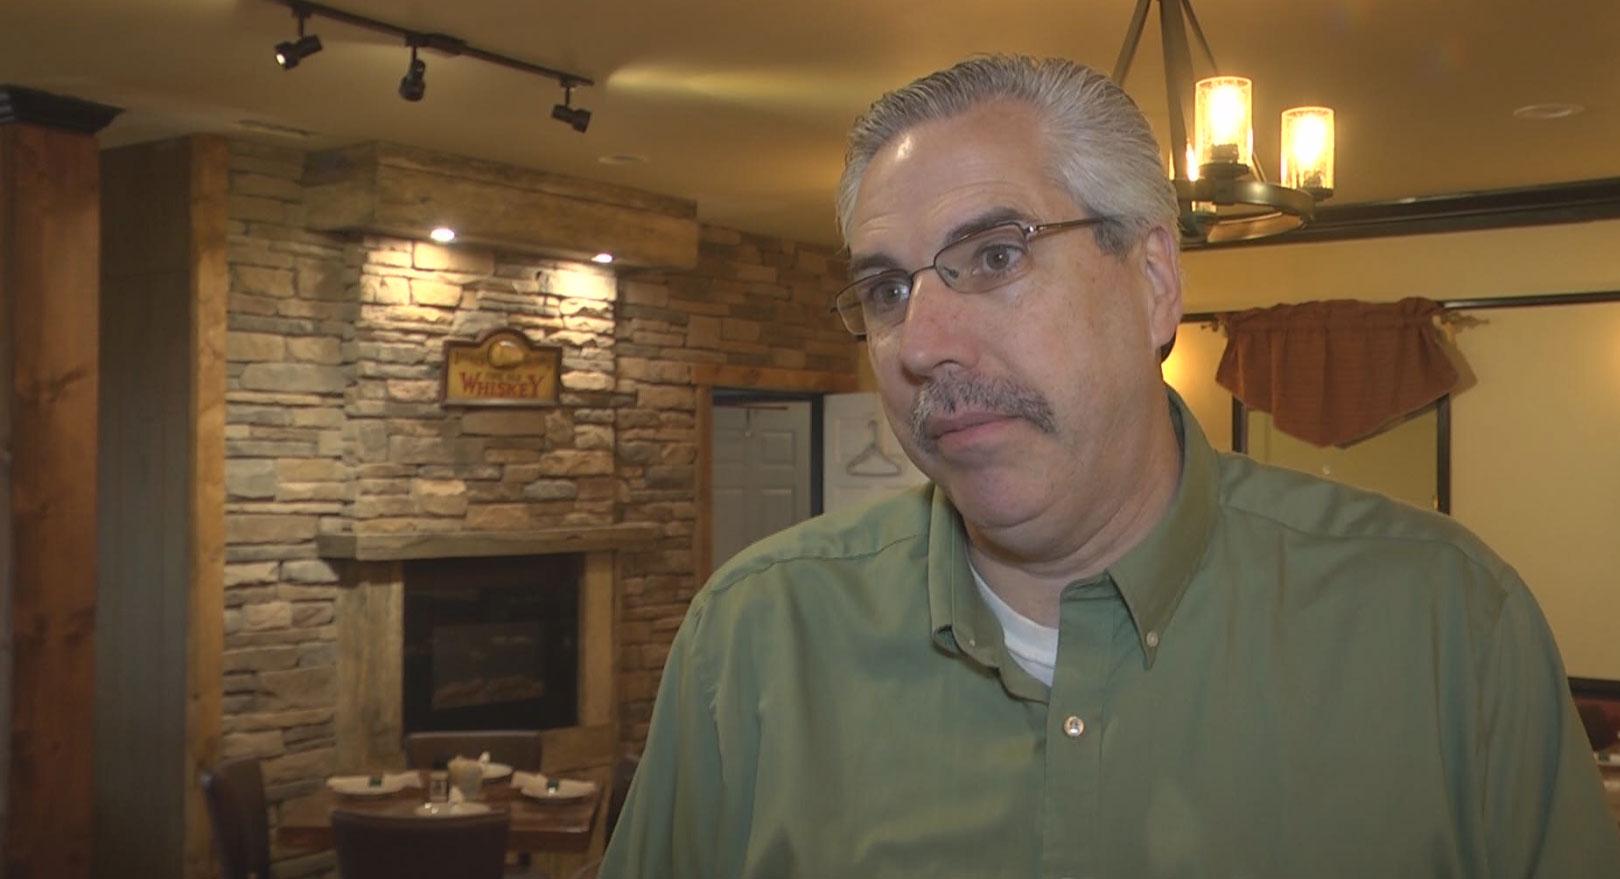 Shawn Haynes, owner of Blue Ridge Cafe